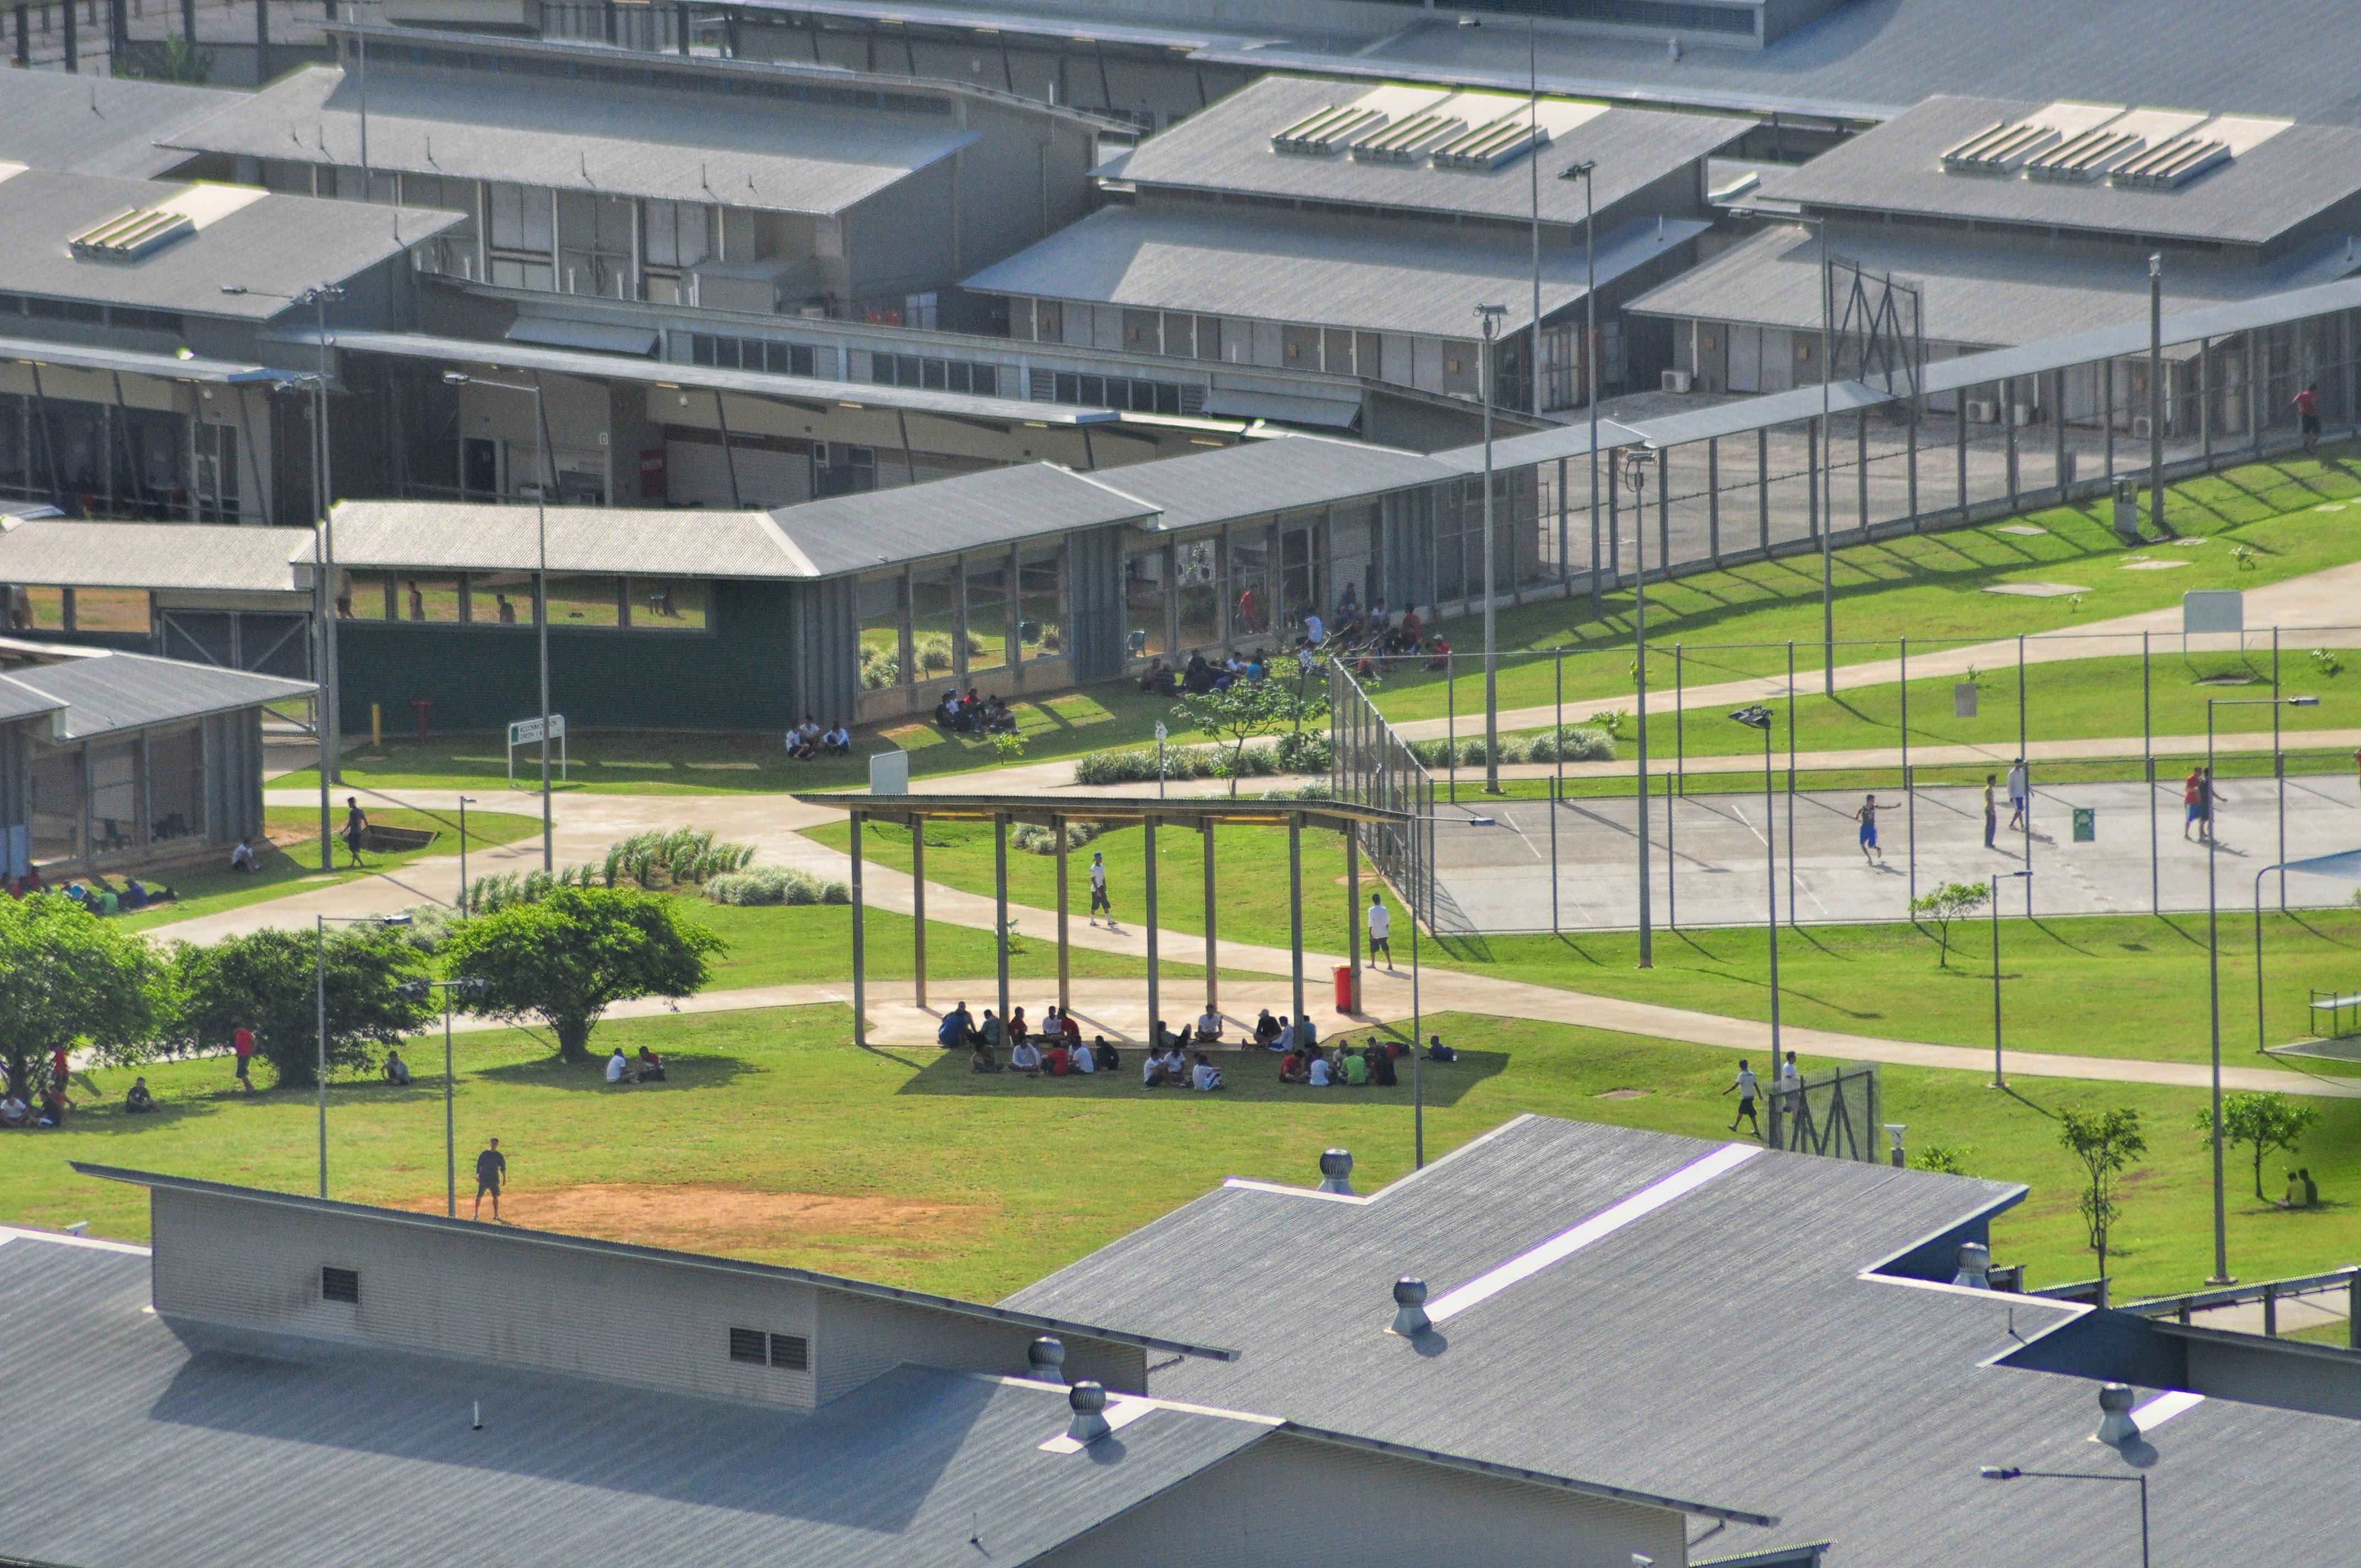 Serco extends controversial Australian migrant detention centre contract